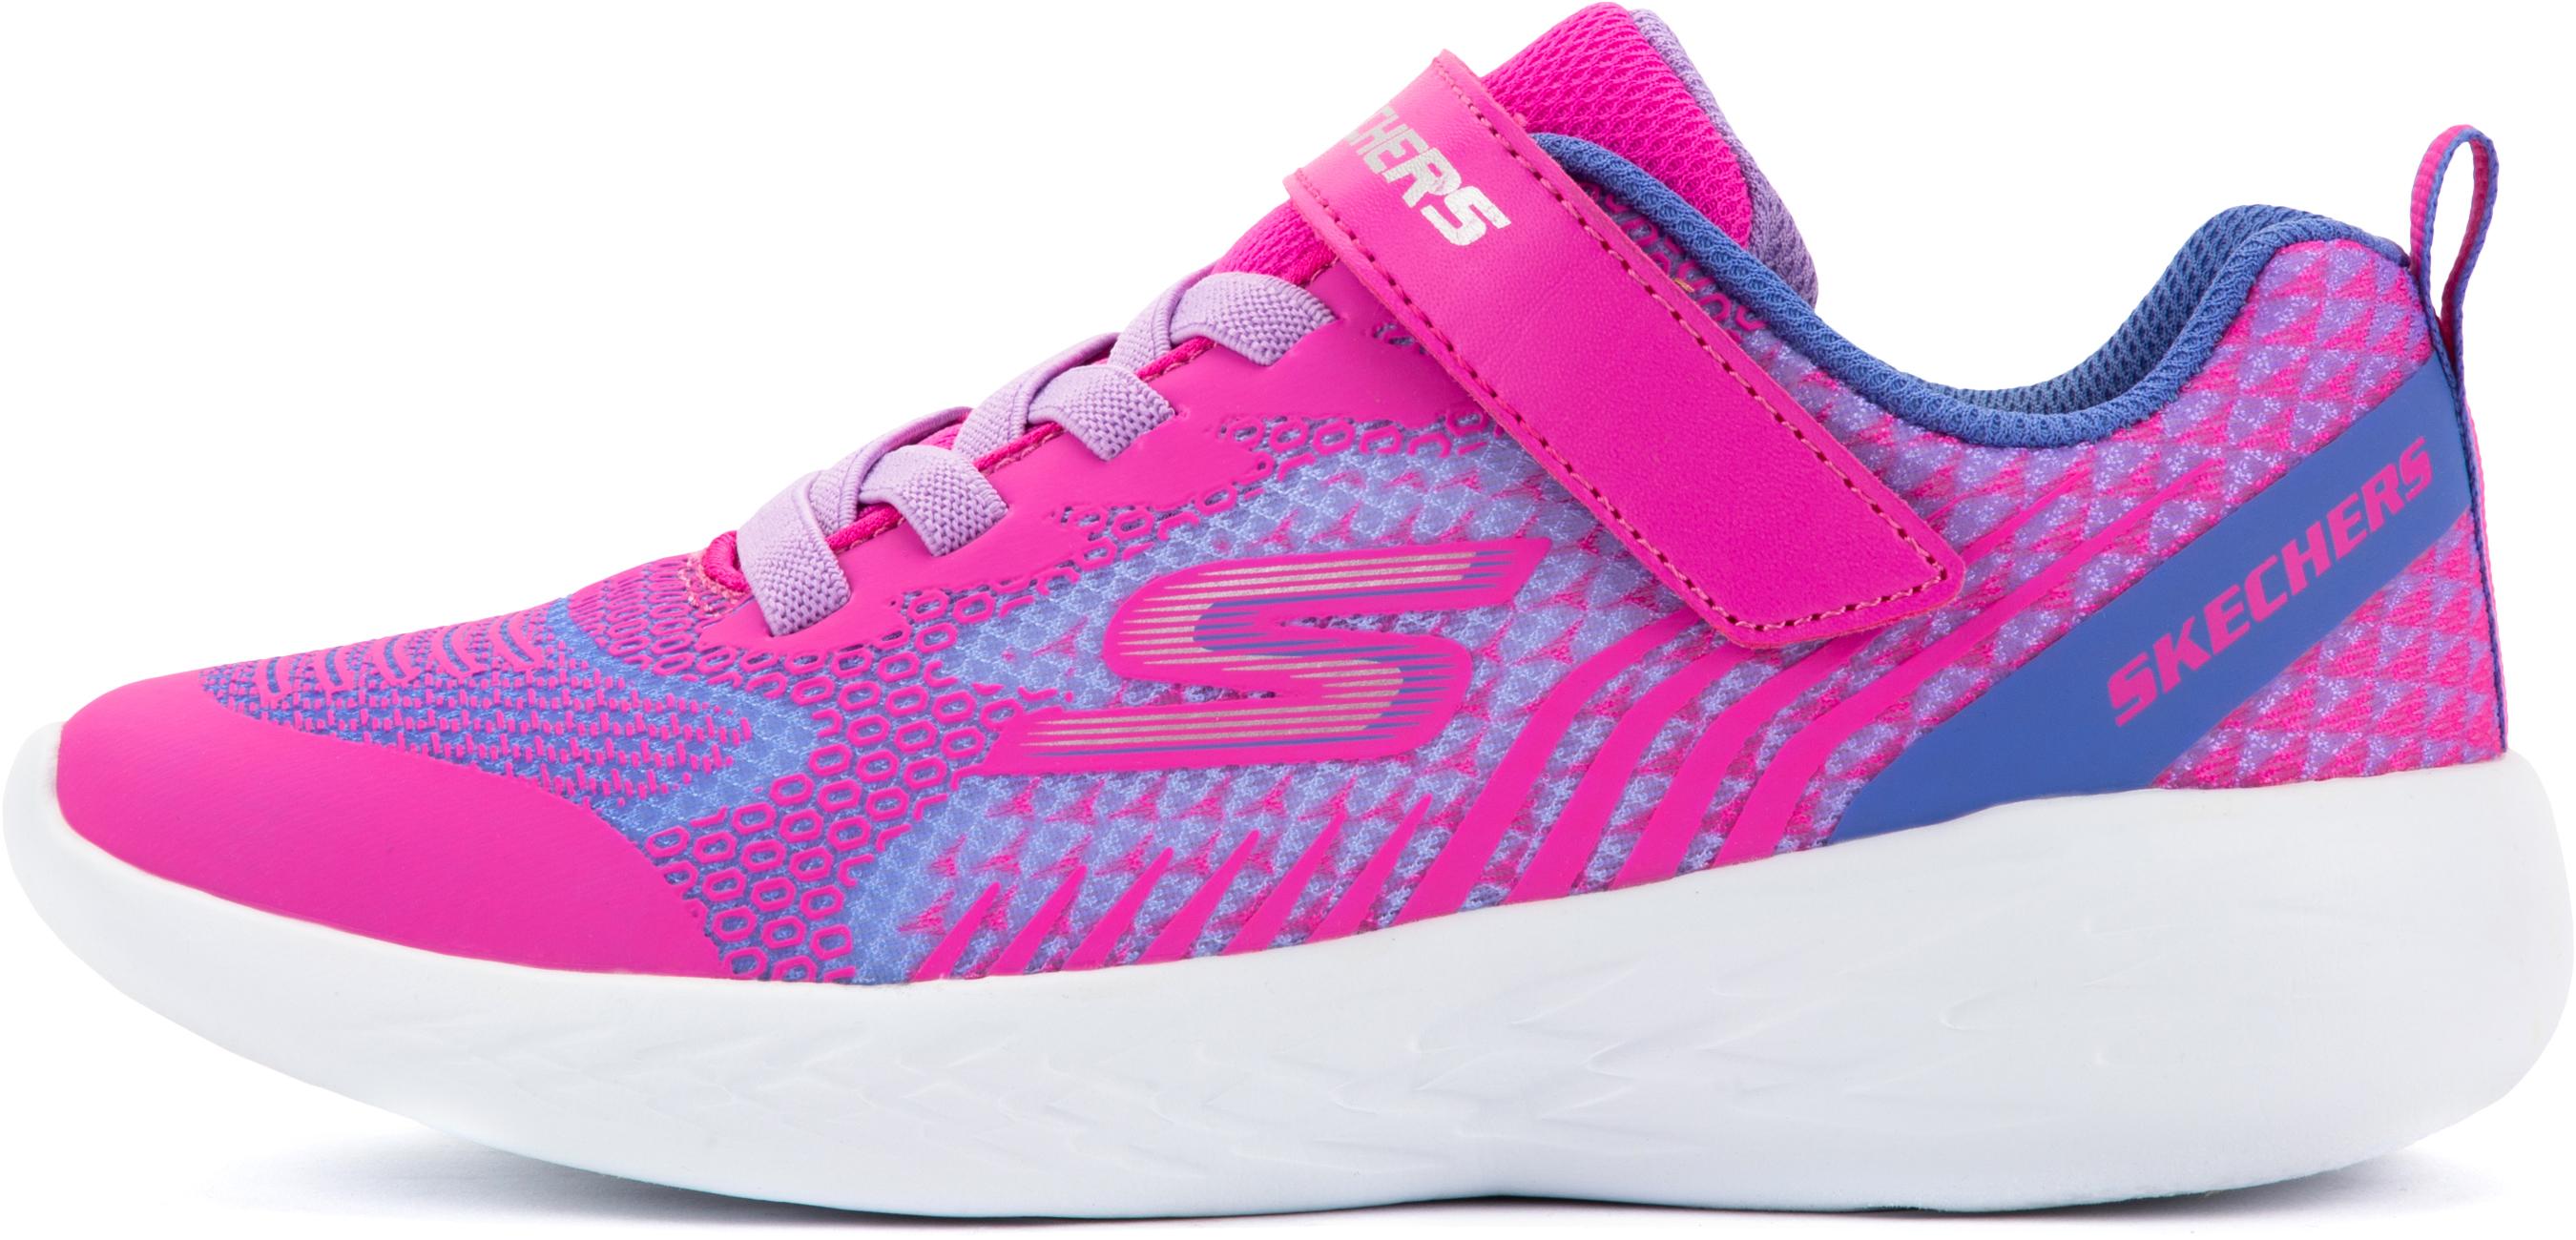 skechers кроссовки для девочек skechers go run 600 sparkle speed размер 38 Skechers Полуботинки для девочек Skechers Go Run 600-Radiant Runner, размер 33